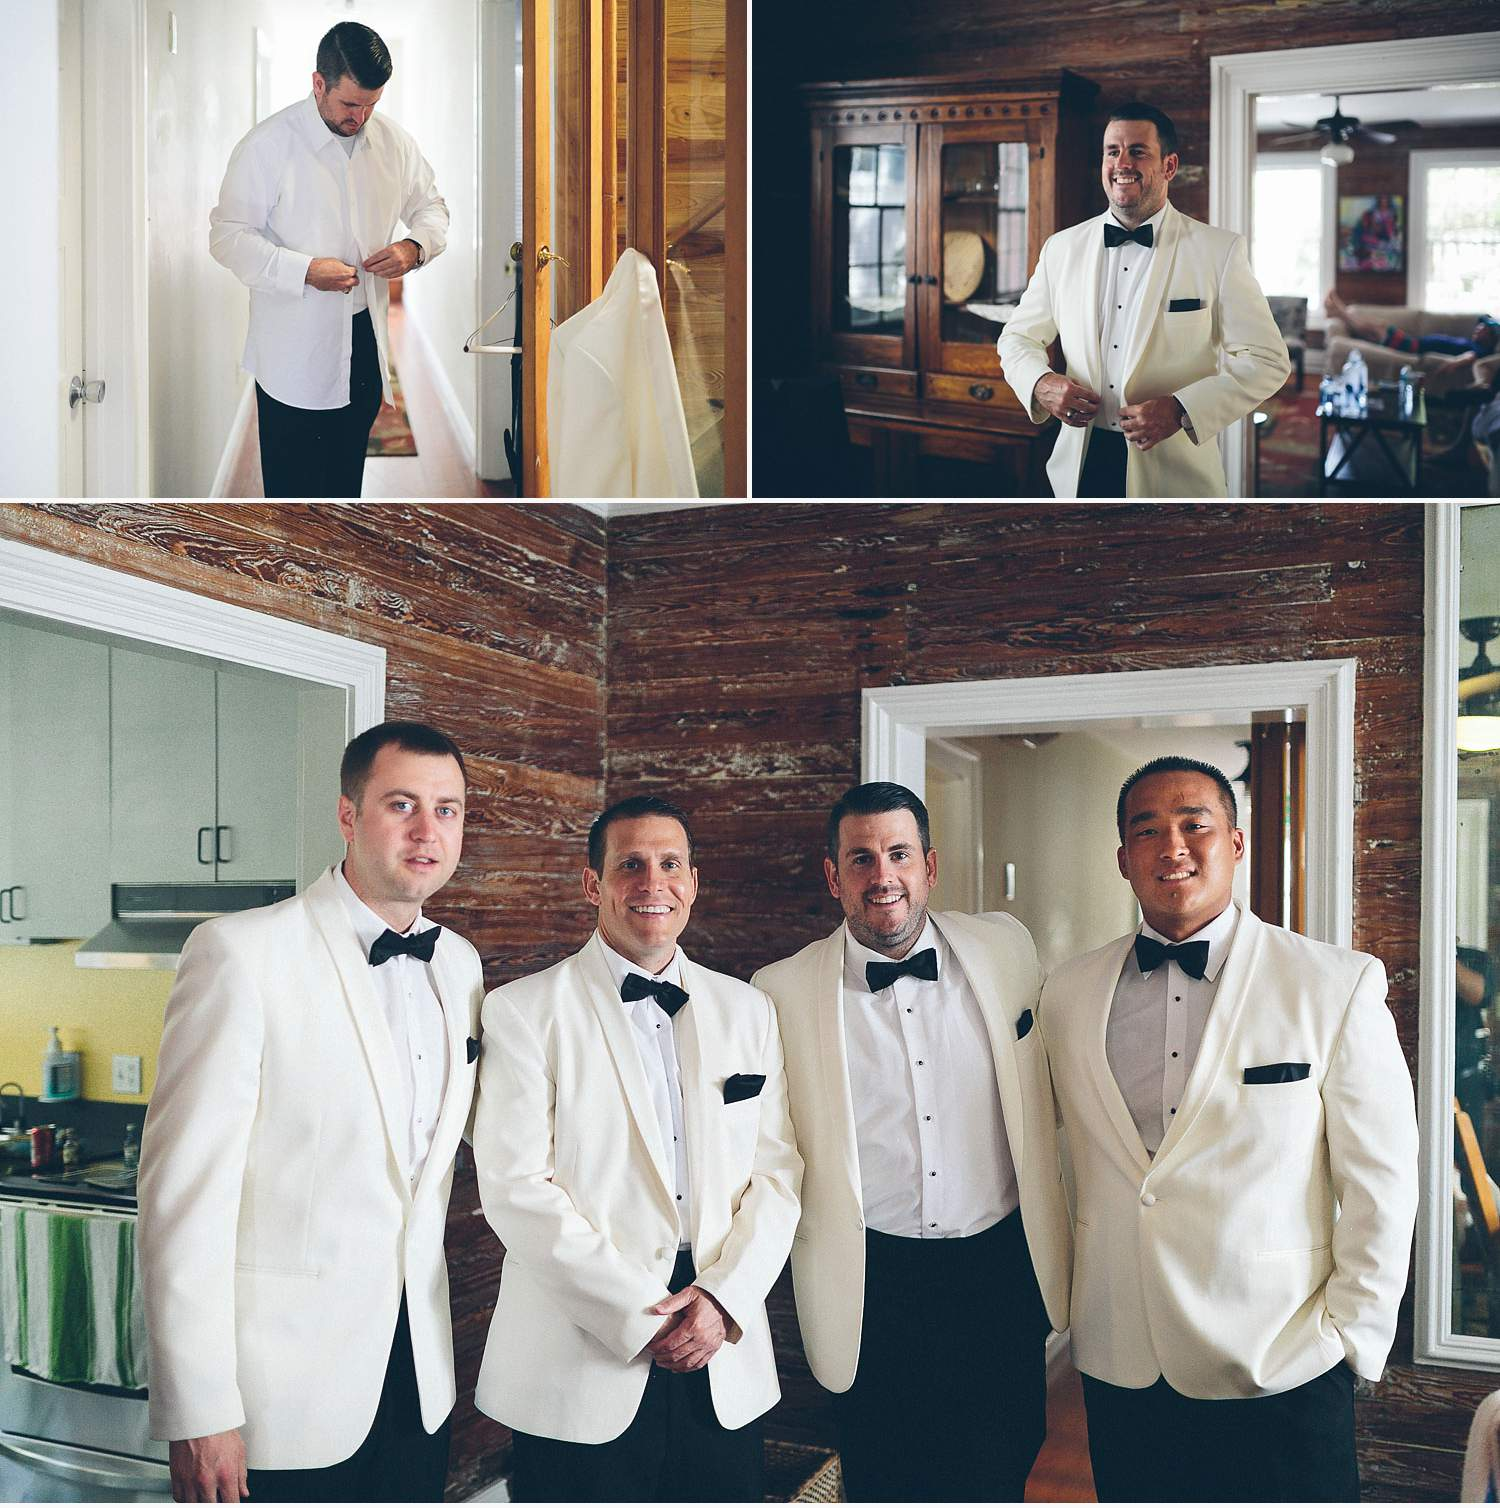 audubon-house-key-west-wedding-photographer-daniel-lateulade-0005.JPG